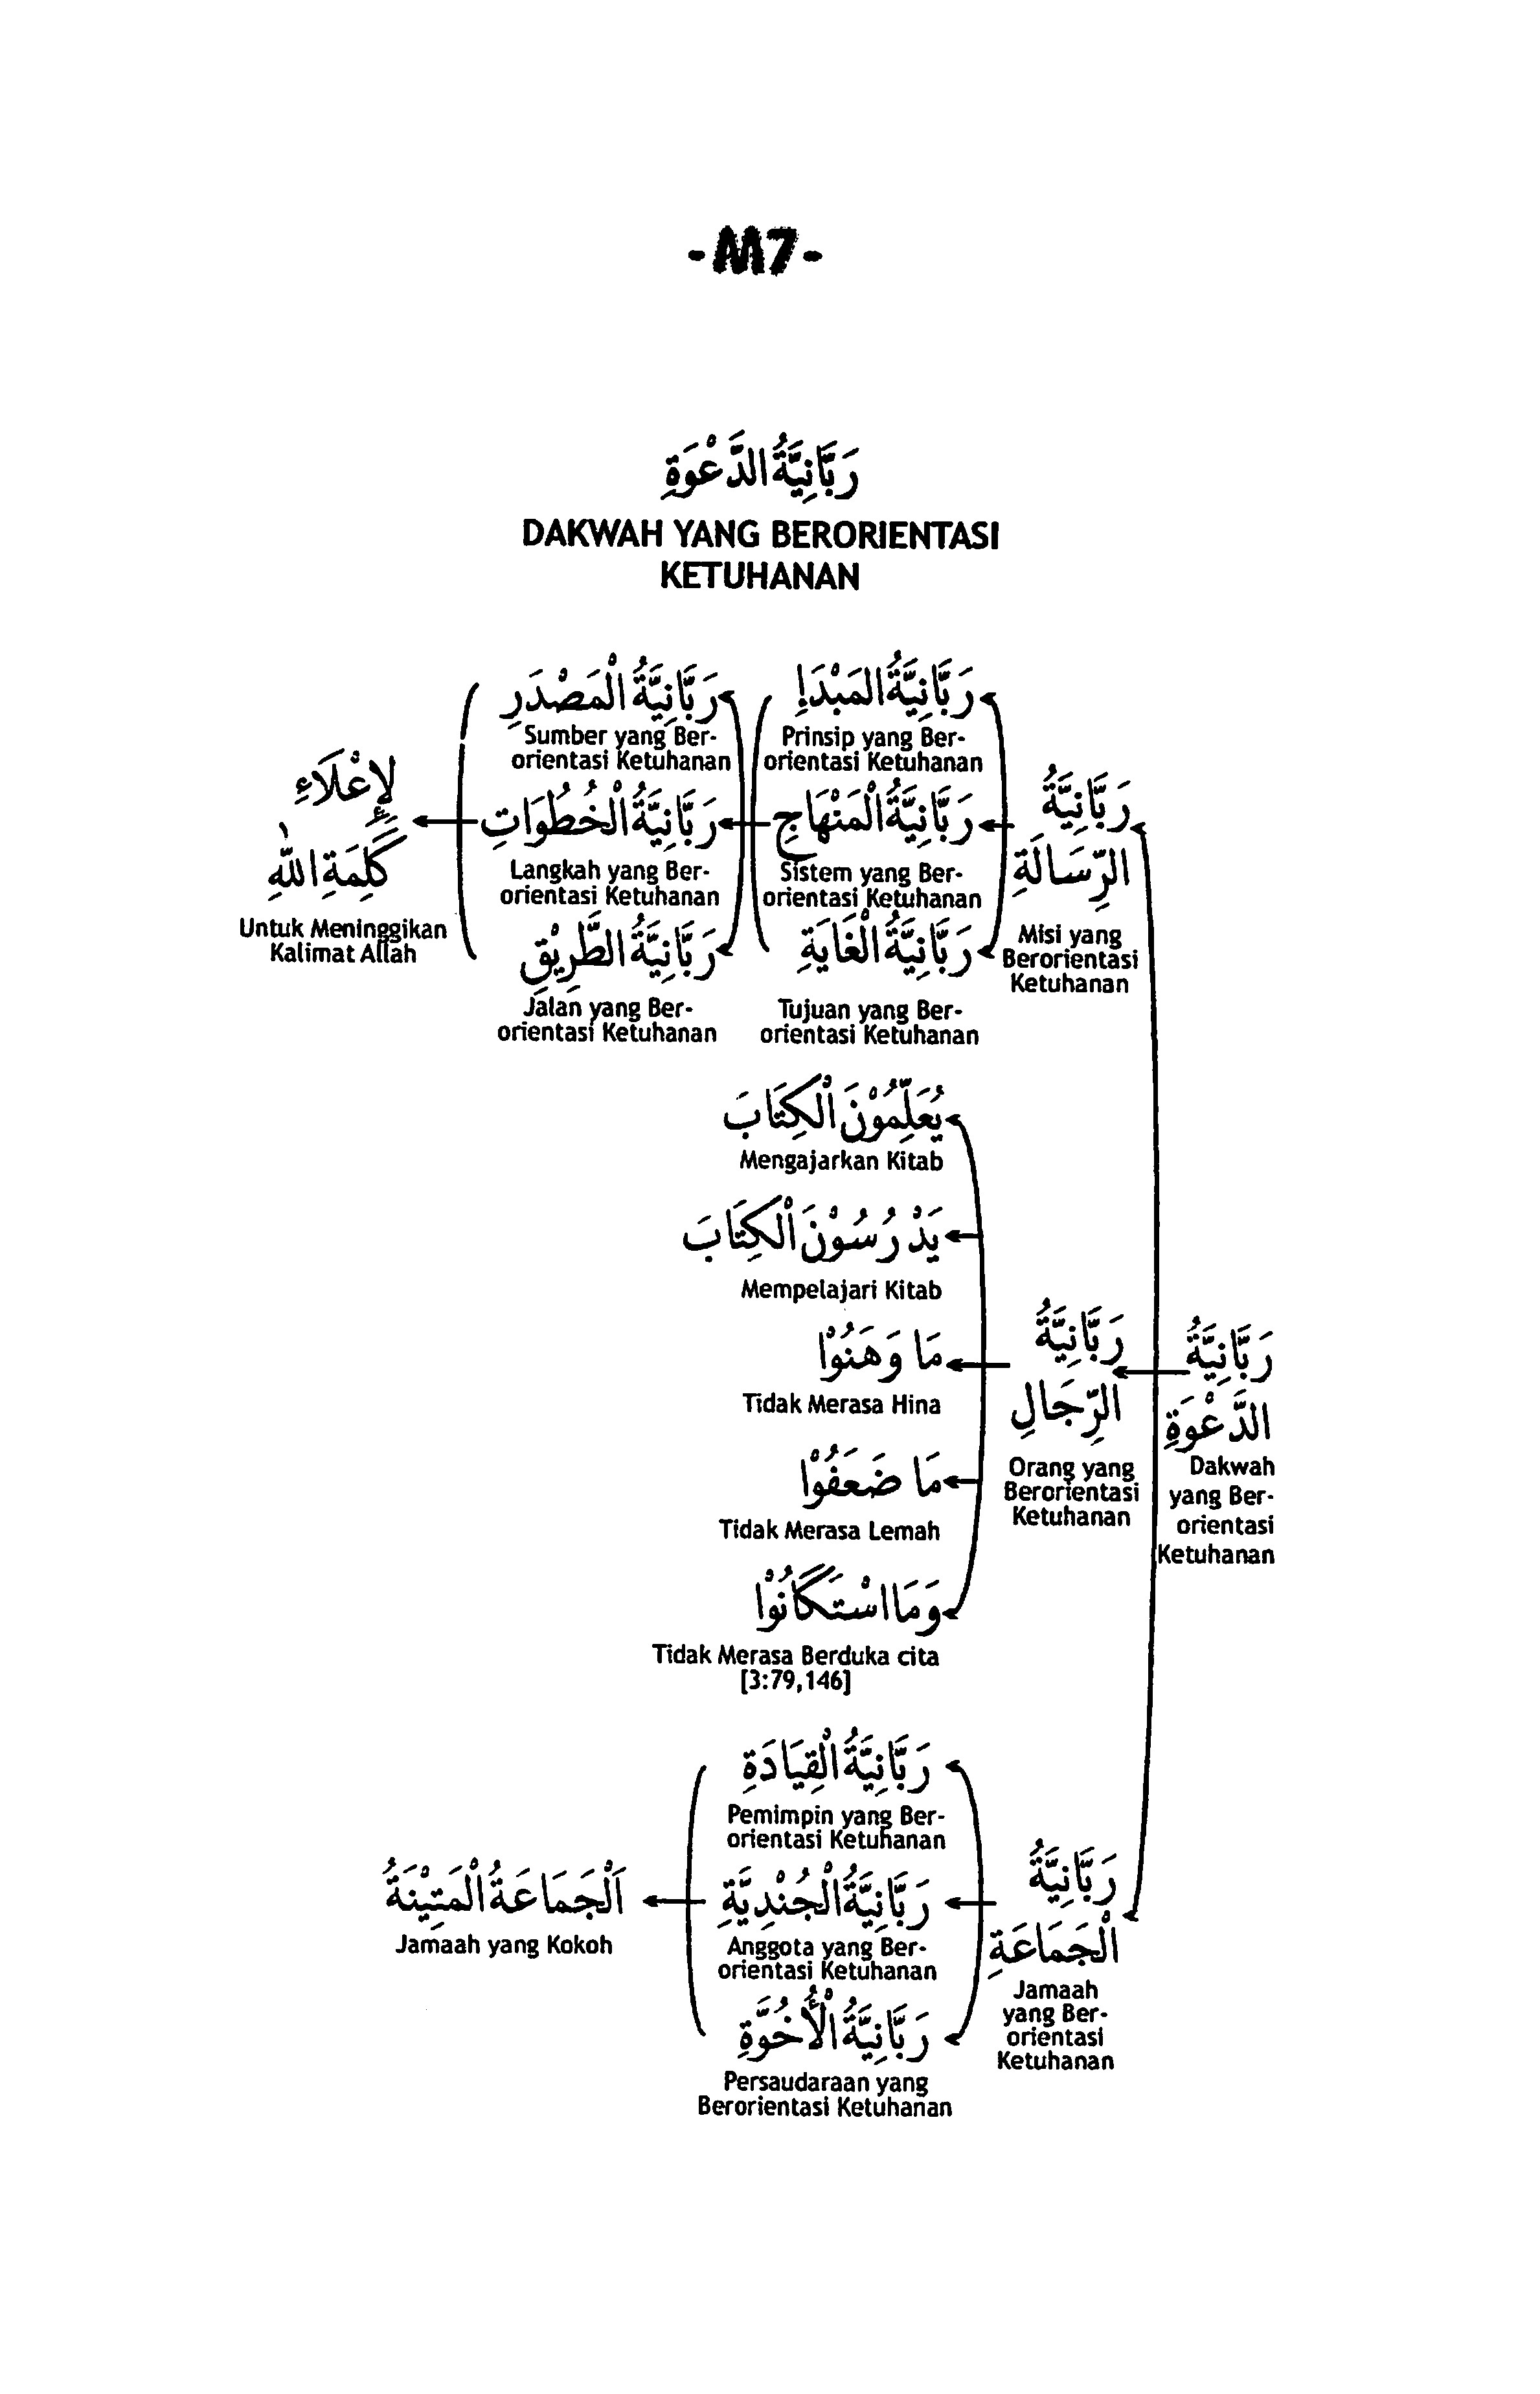 Skripsi Pendidikan Agama Islam Tarbiyah Kuantitatif Bahan Ajar Lembar Kerja Siswa Lks Untuk Meningkatkan 2378 X 3696 Jpeg 637kb Materi Tarbiyah Rasmul Bayan Tarbiyah